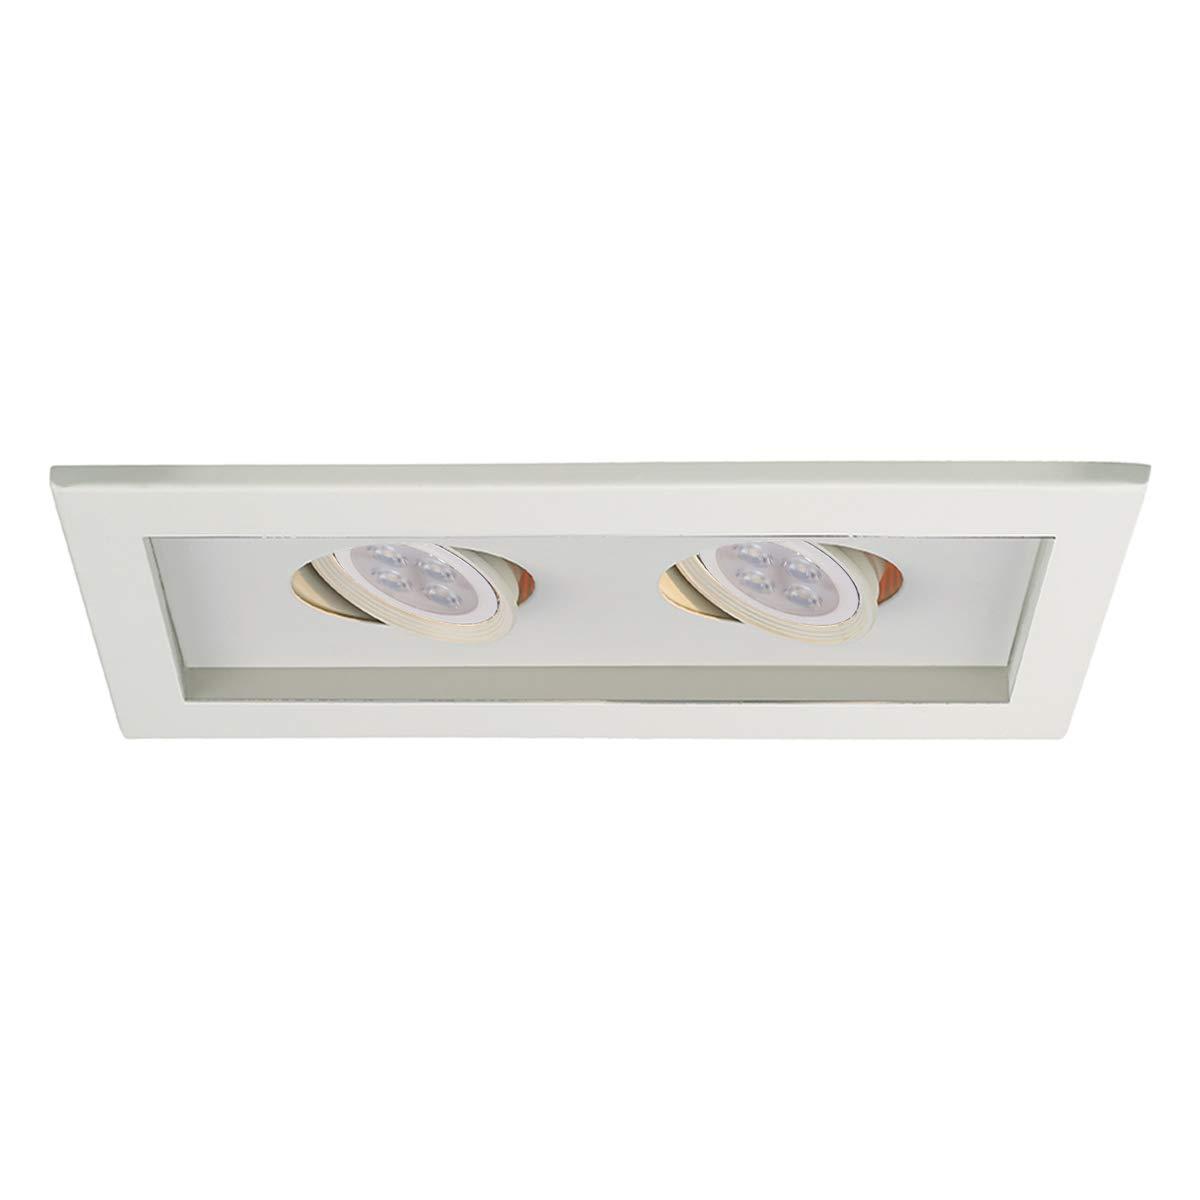 WAC Lighting MT-216LED-WT//WT Low Voltage Multiple Two Trim LED Recessed Light